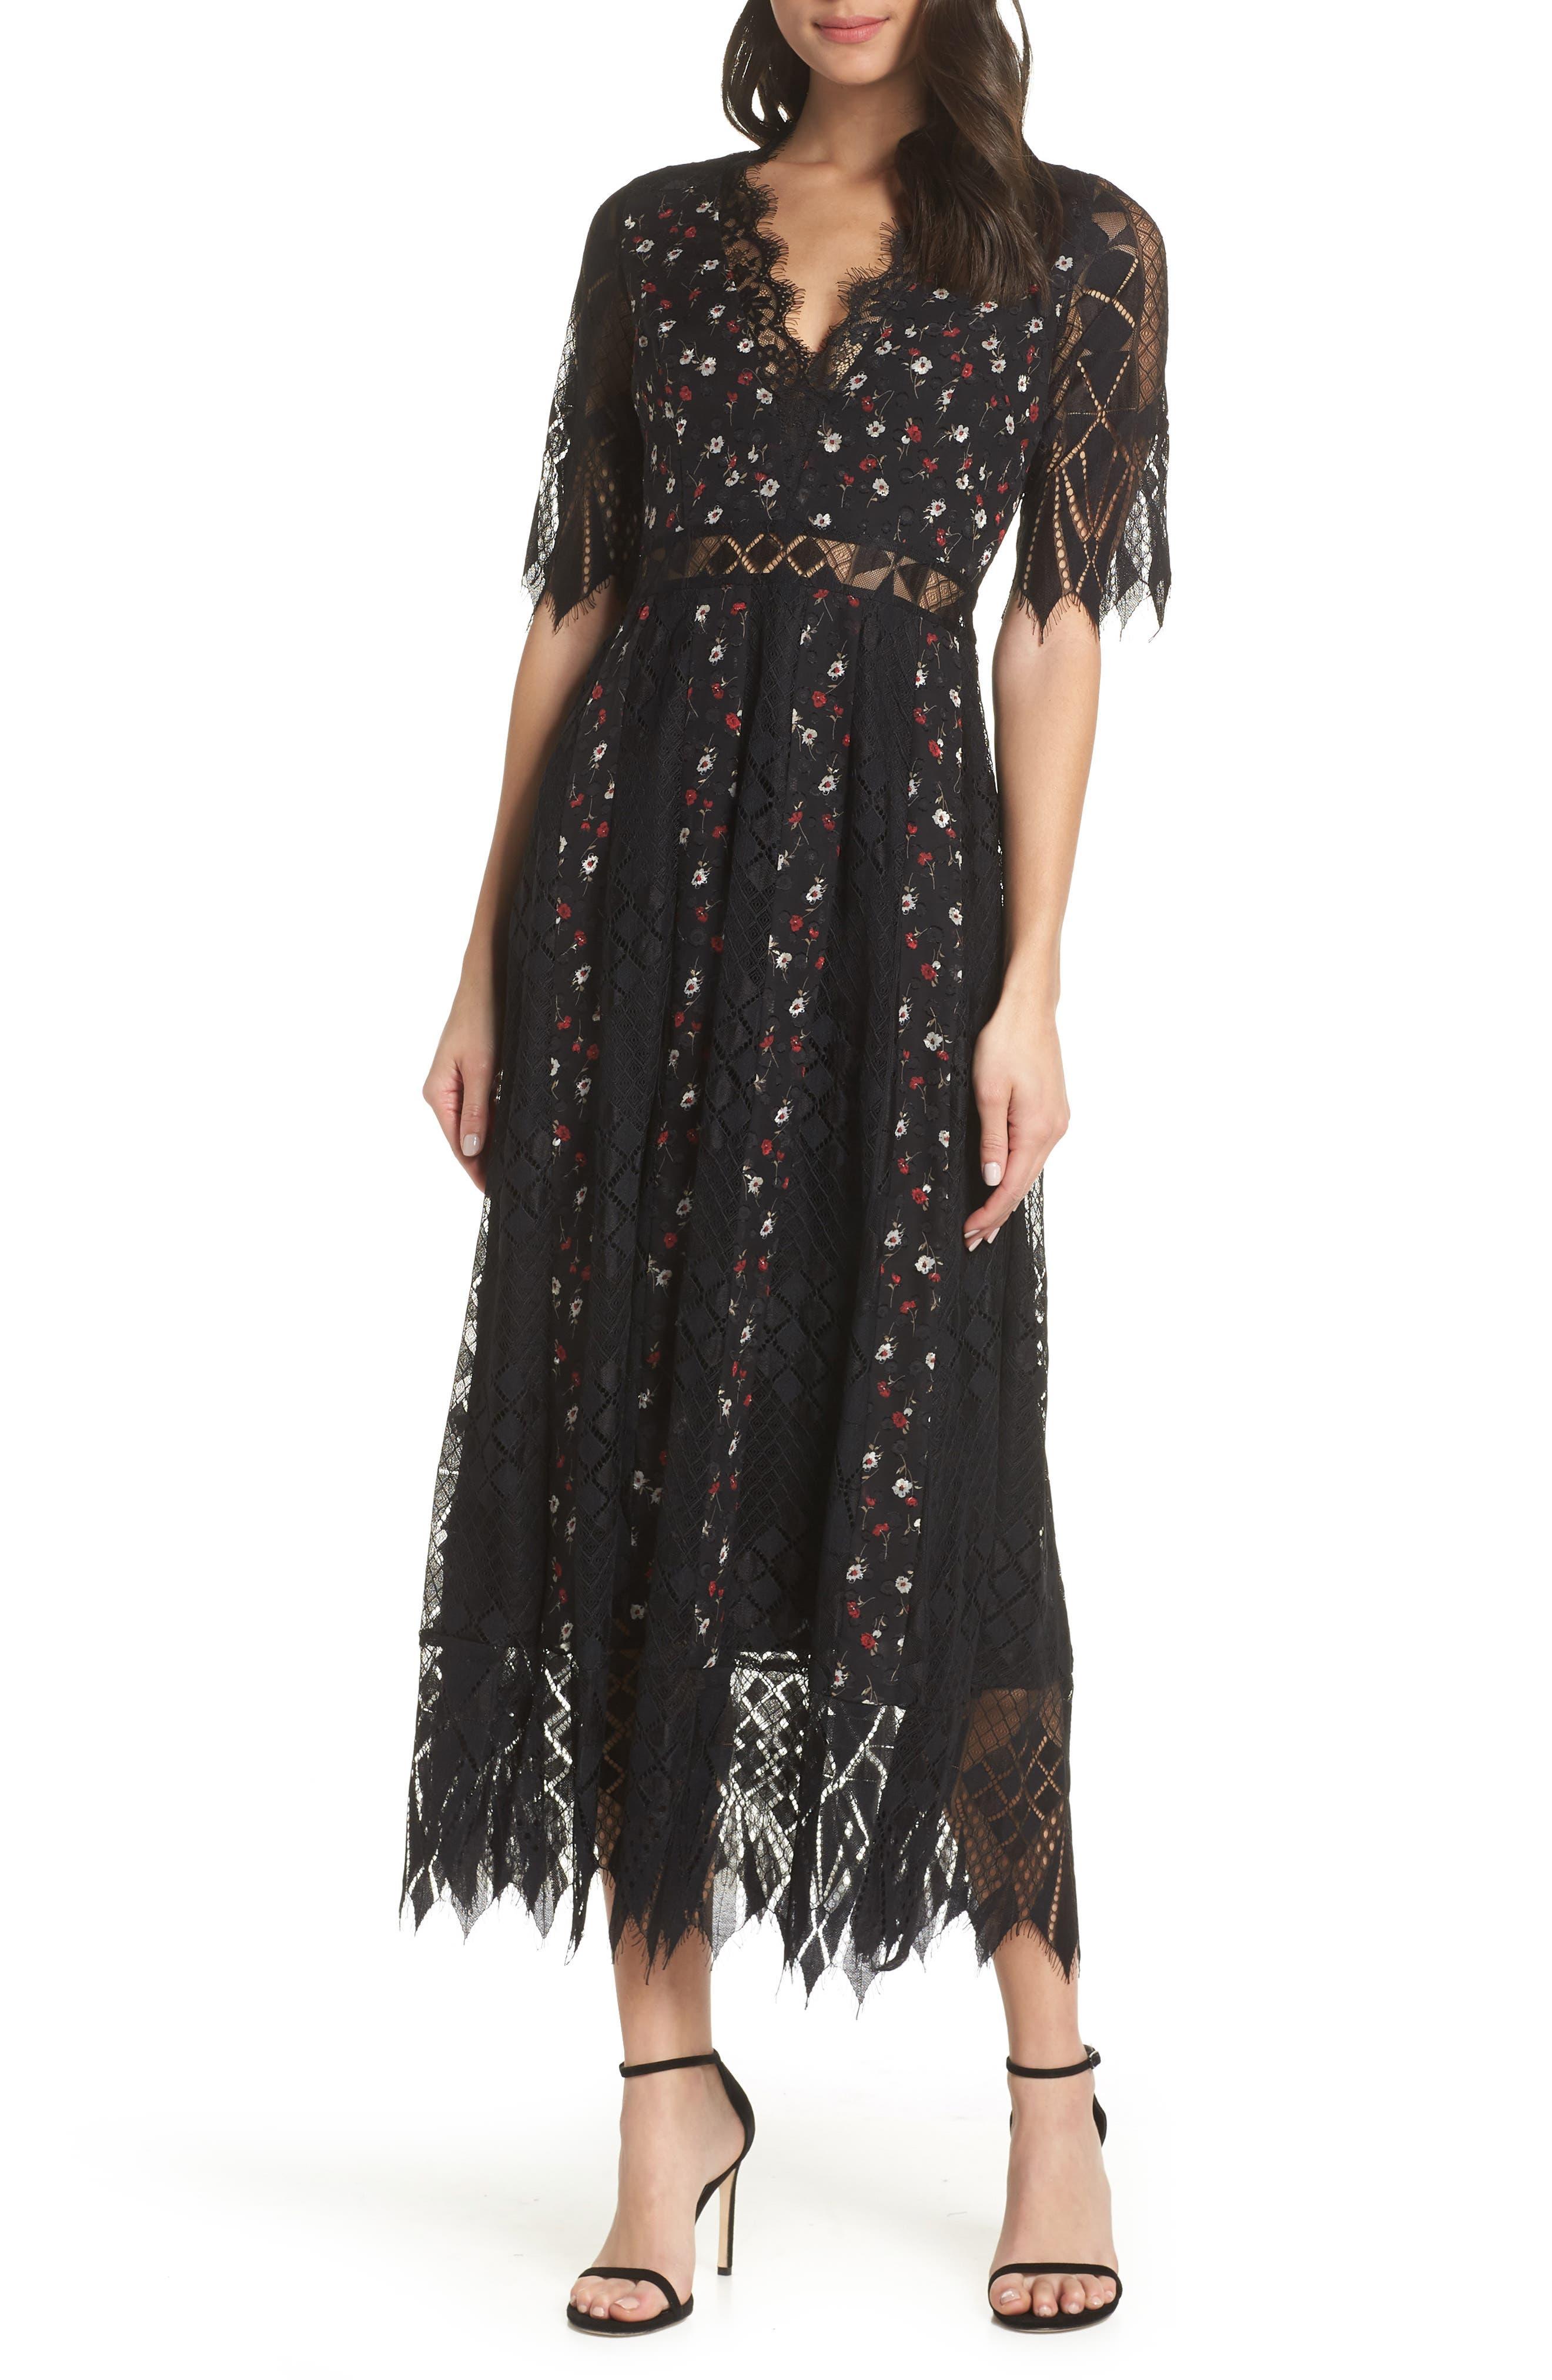 FOXIEDOX, Josefine Lace & Clip Dot Tea Length Dress, Main thumbnail 1, color, 001